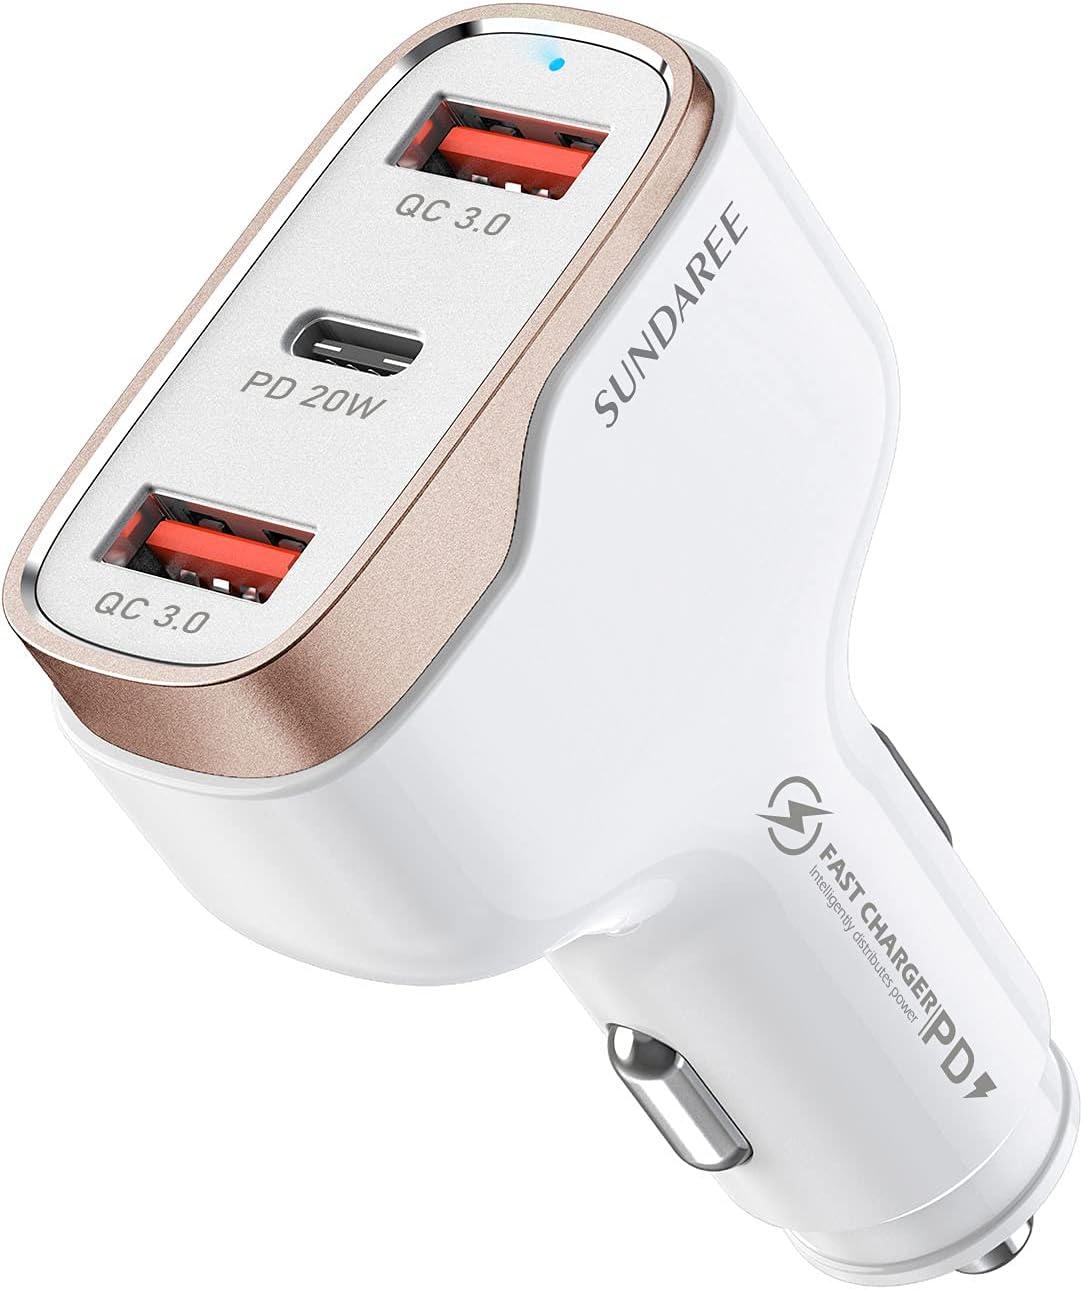 SUNDAREE Cargador Coche Tipo C,38W 3 Port 12V~24V PD&QC 3.0 Qucik Charge Carga Rapida USB C Mechero Adaptador for Xiaomi redmi Note 10/Poco/Samsung A21 A51/iphone 12 /Pad/OPPO/OnePlus/Huawei/Table